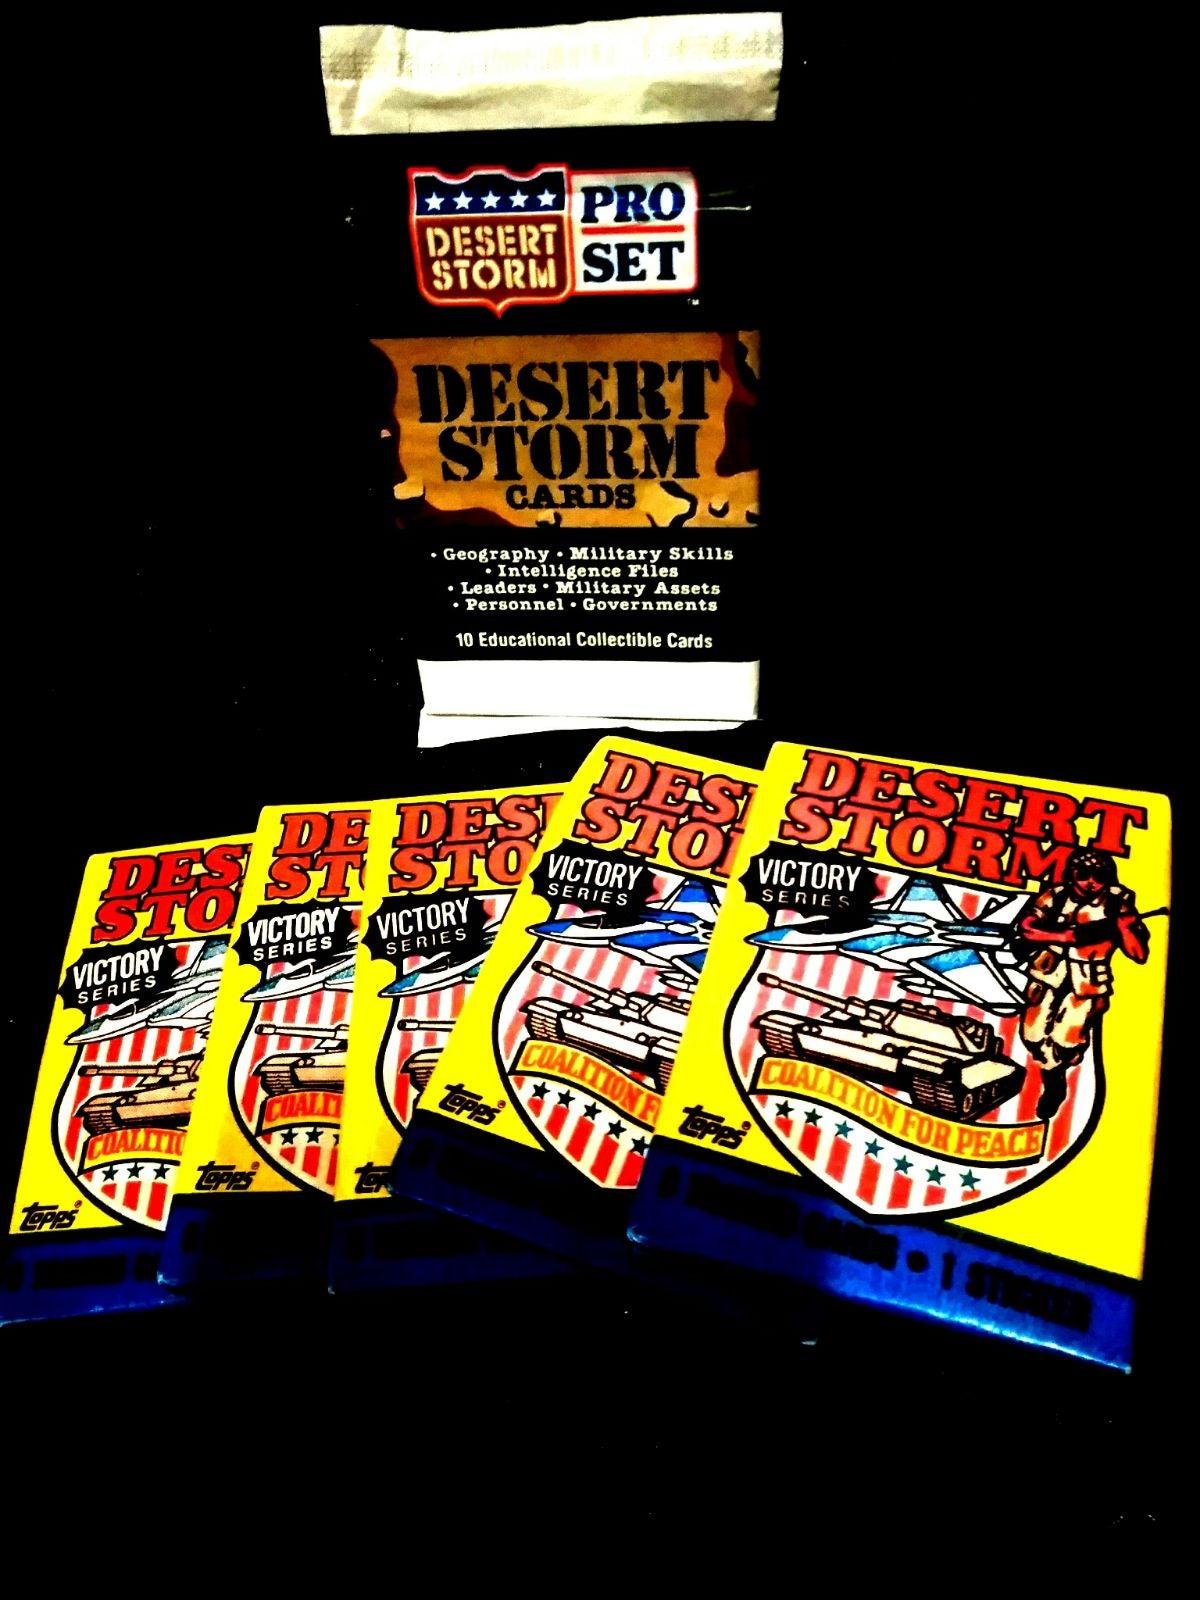 Desert Storm Victory Cards